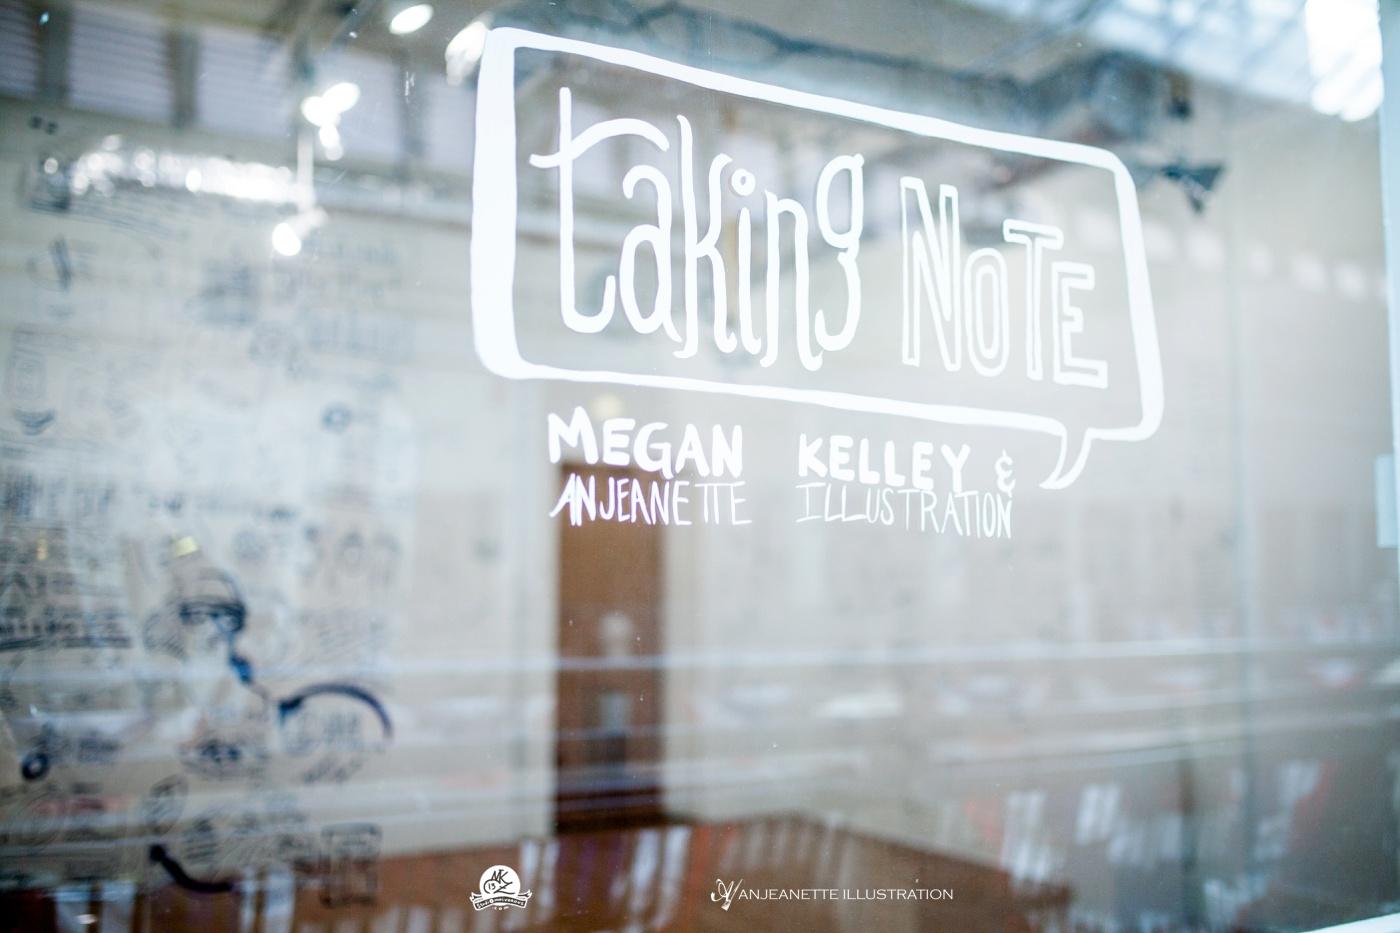 Nashville art crawl